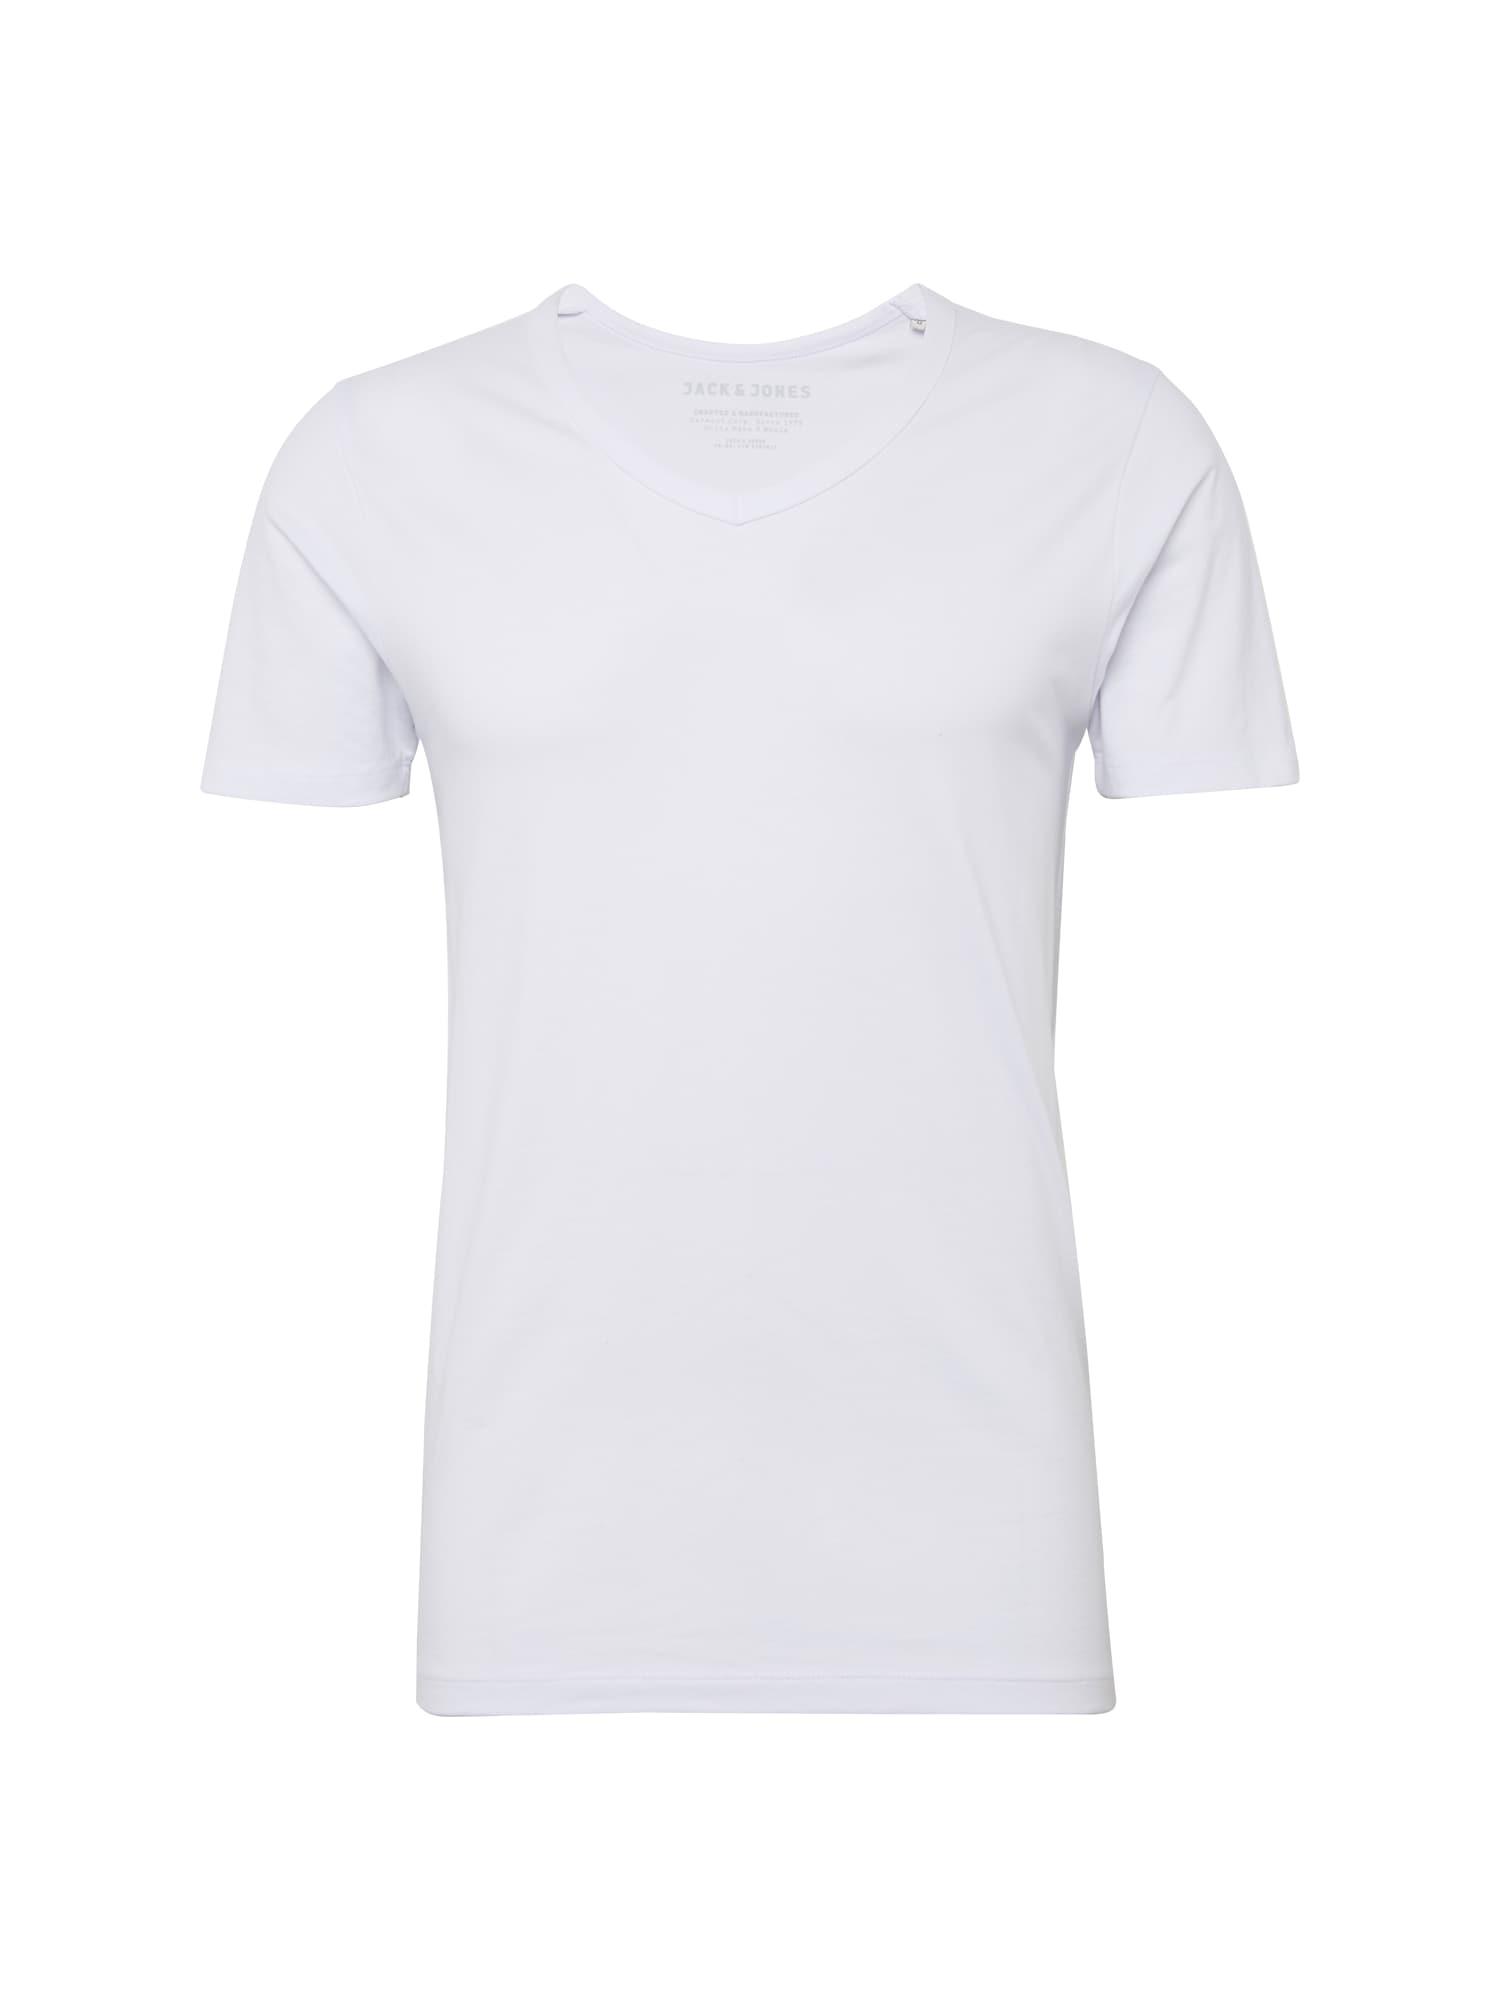 JACK & JONES Marškinėliai 'BASIC V-NECK TEE S/S NOOS' balta